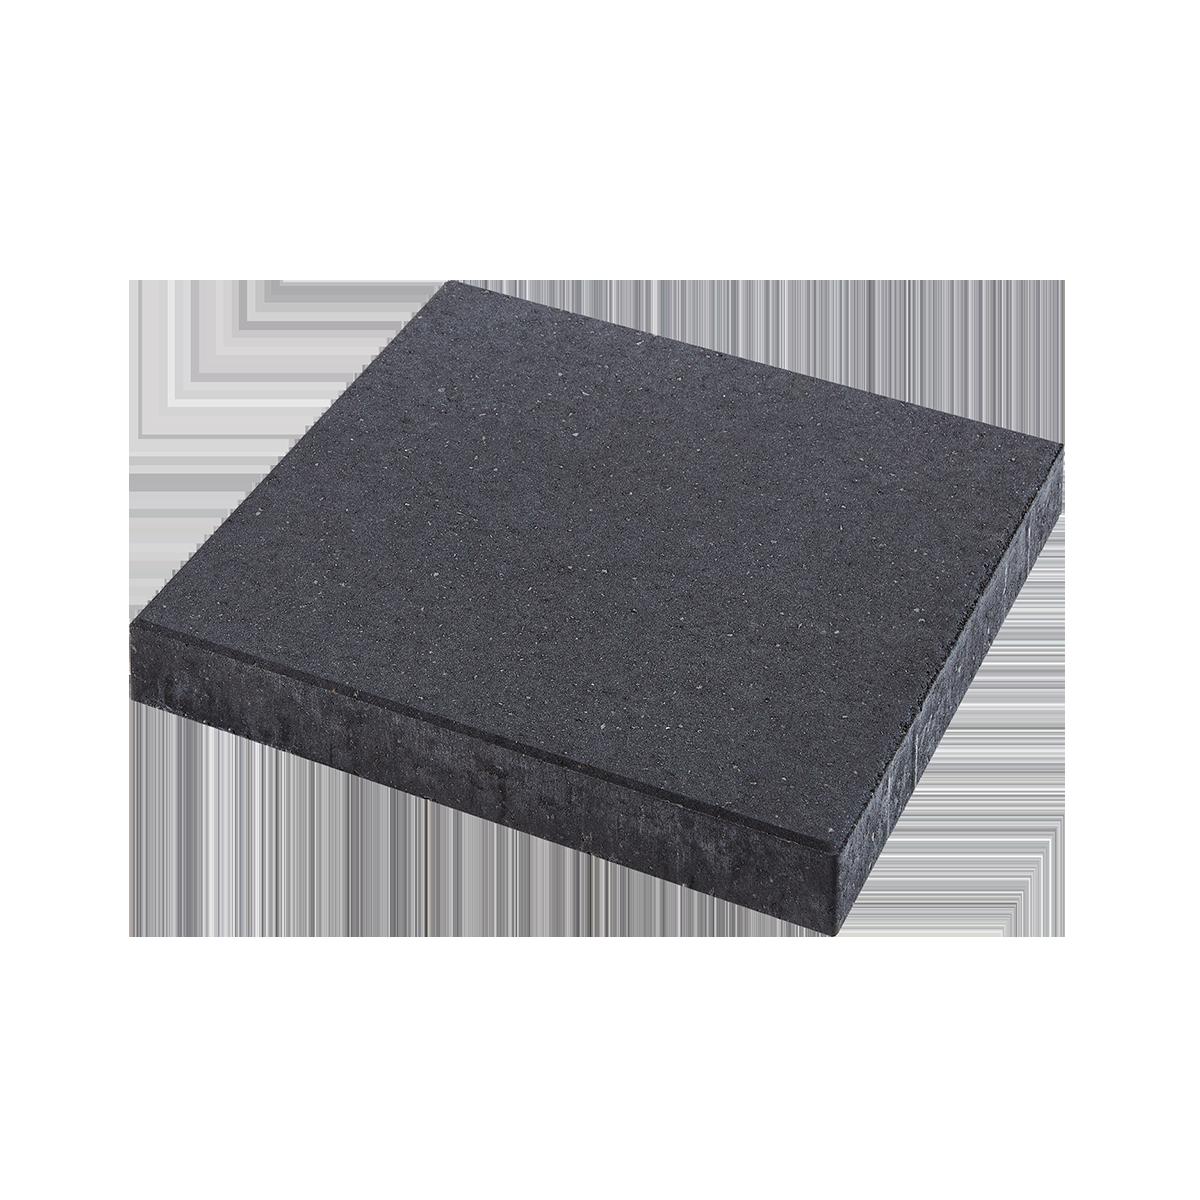 Fliser 50x50x5 cm Sort/Antracit